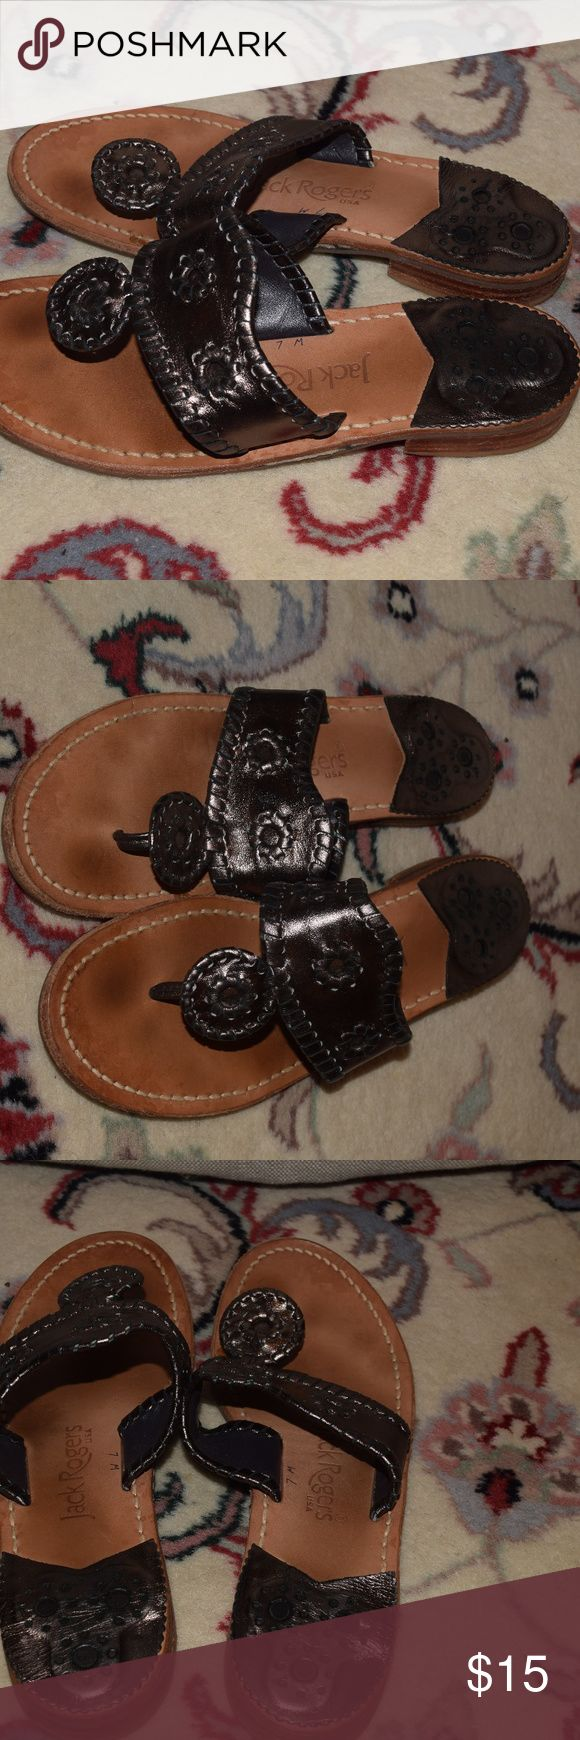 Jack Rogers Pewter Sandals Jack Rogers Pewter Sandals Jack Rogers Shoes Sandals